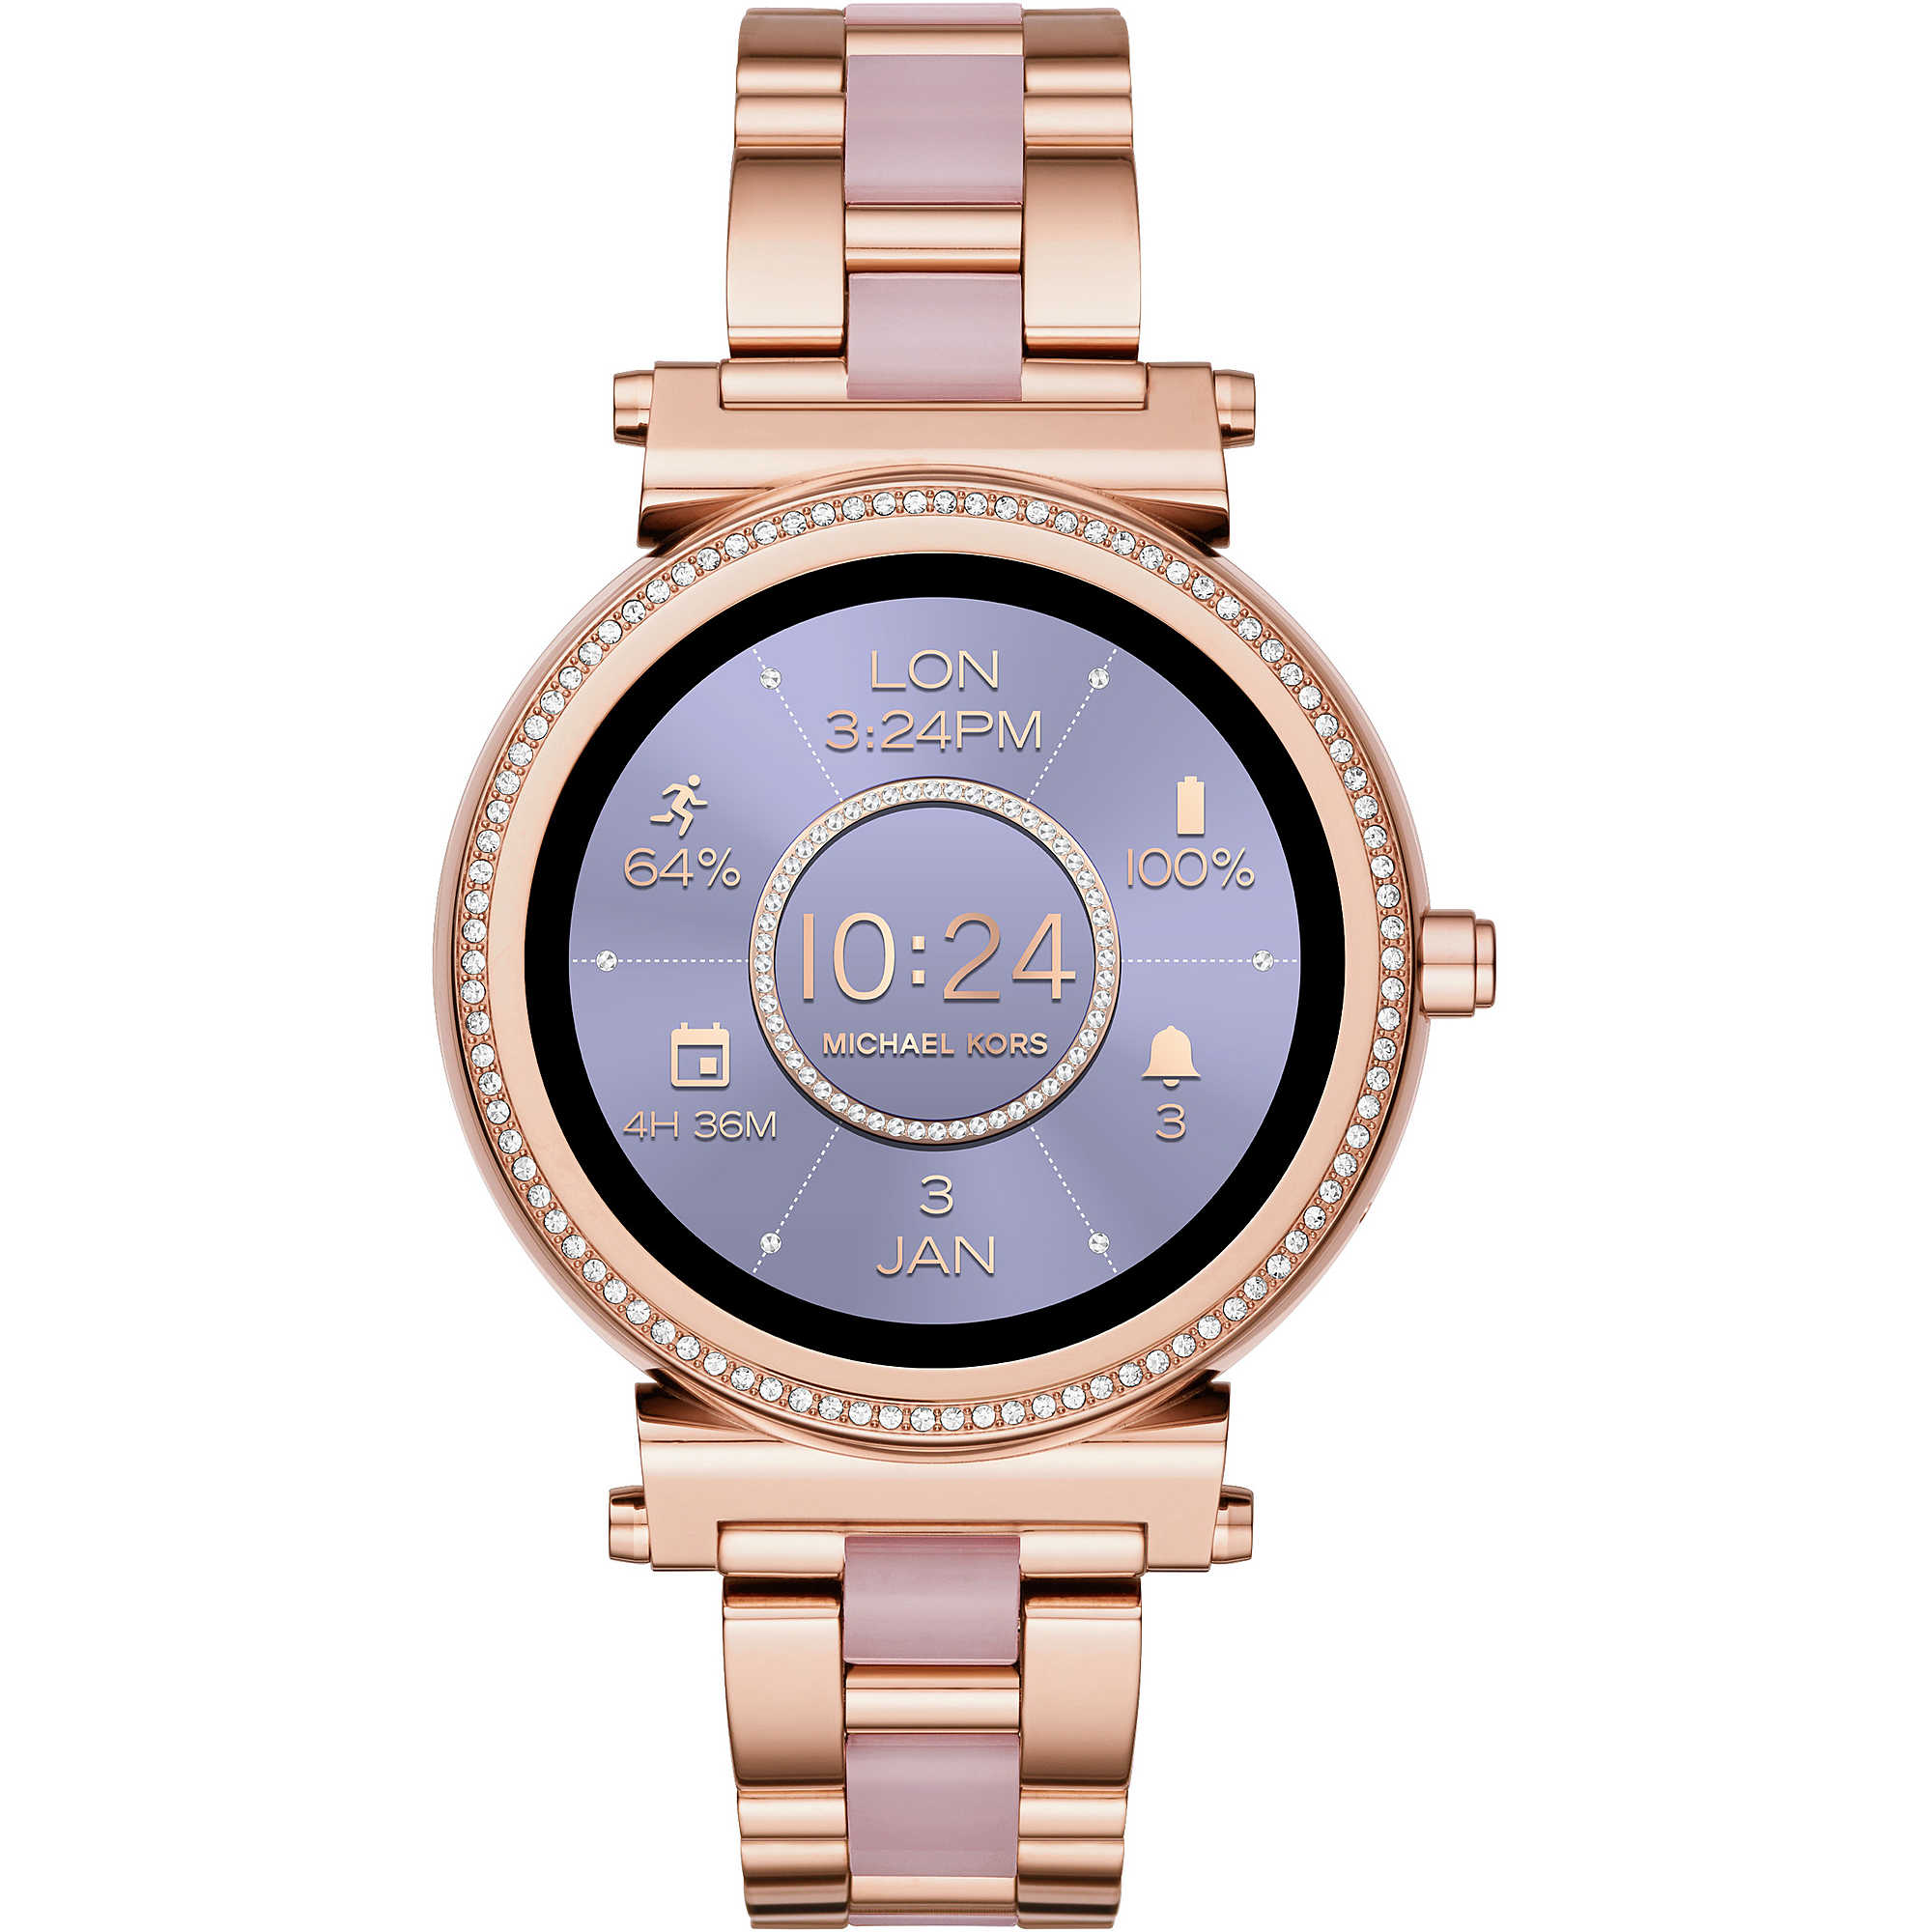 58475fee3ec Uhr Smartwatch frau Michael Kors Sofie MKT5041 Smartwatches Michael Kors